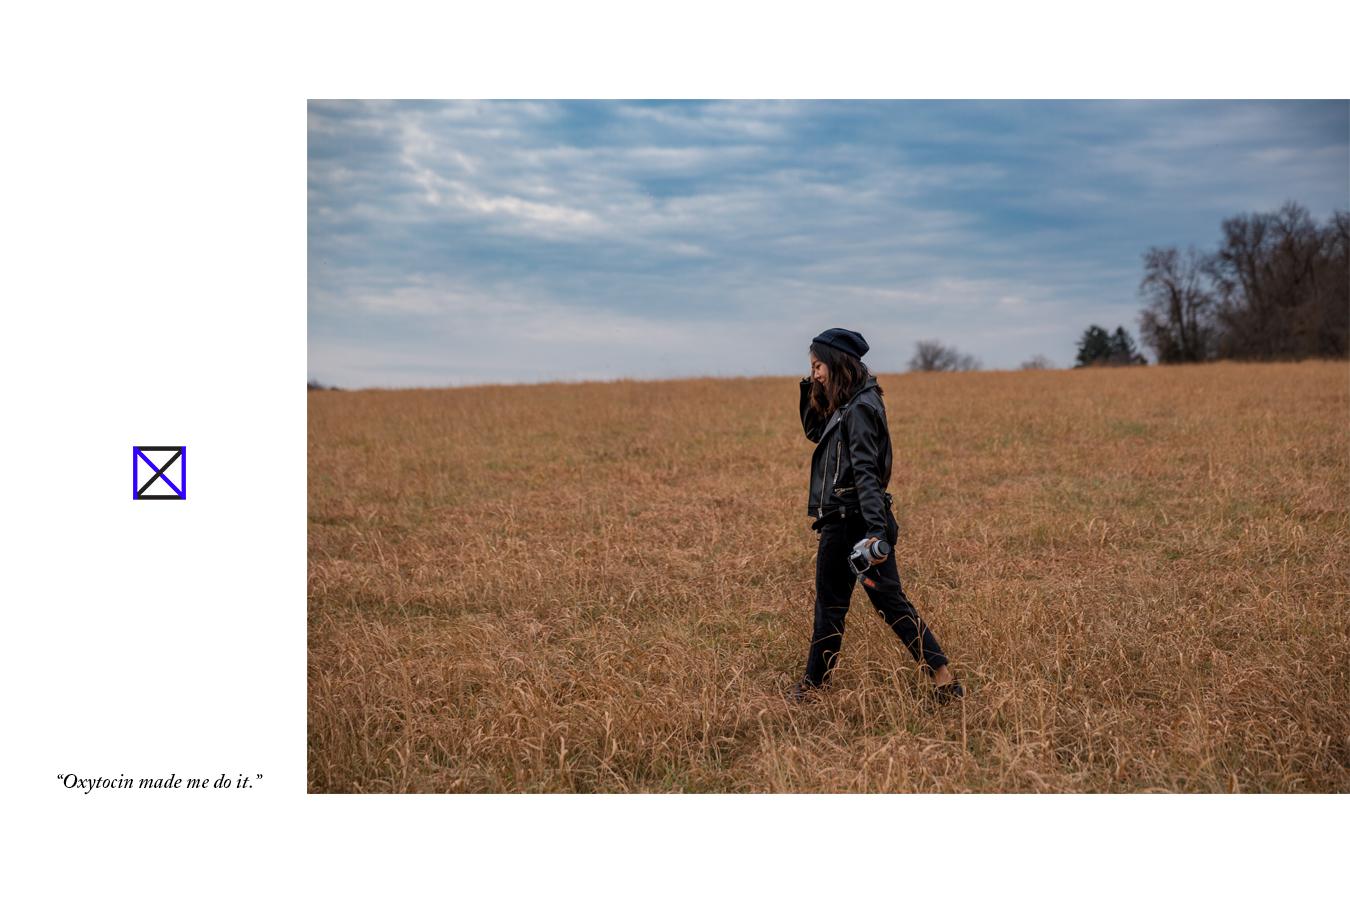 Noel_Zheng_Tony_Ward_University_of_Pennsylvania_Photography_Fashion_Editorial_Ad_Campaign_Avante_Garde_Photoshoot_Travel_Lifestyle_Danielle_Goh_Karen_Yang_Justin_Yue_Nadia_Kim_3